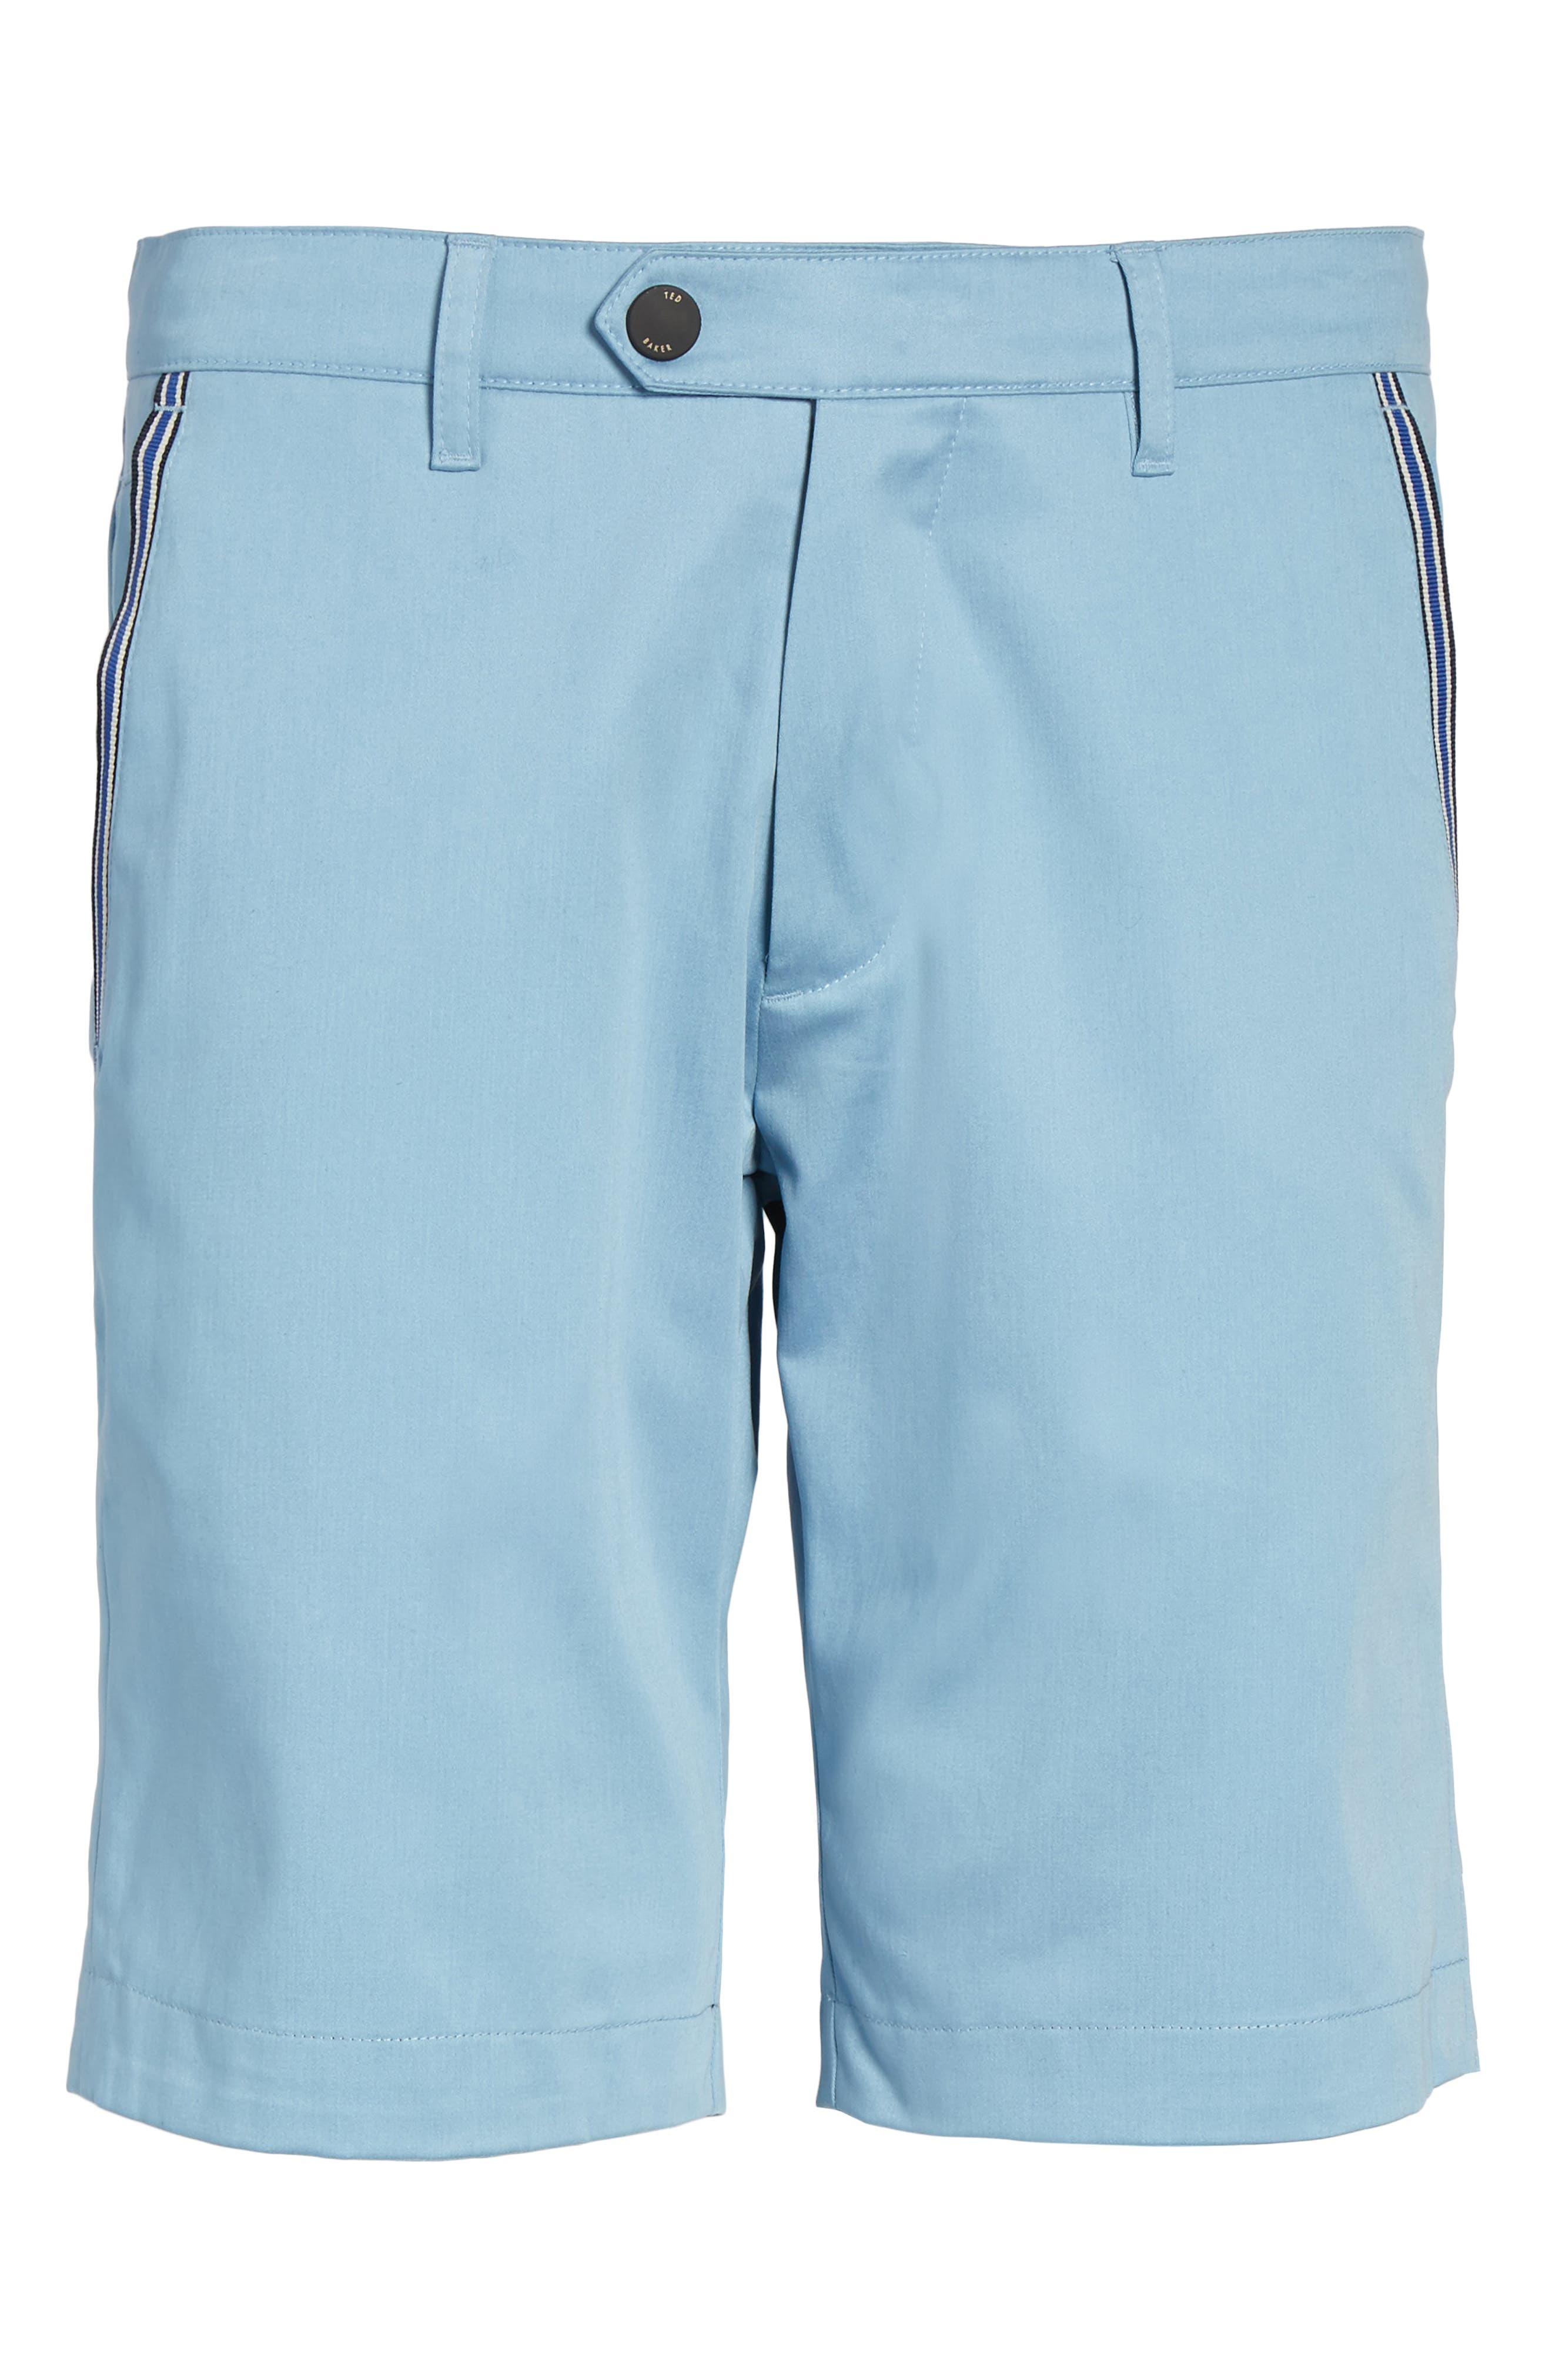 Golf Shorts,                             Alternate thumbnail 17, color,